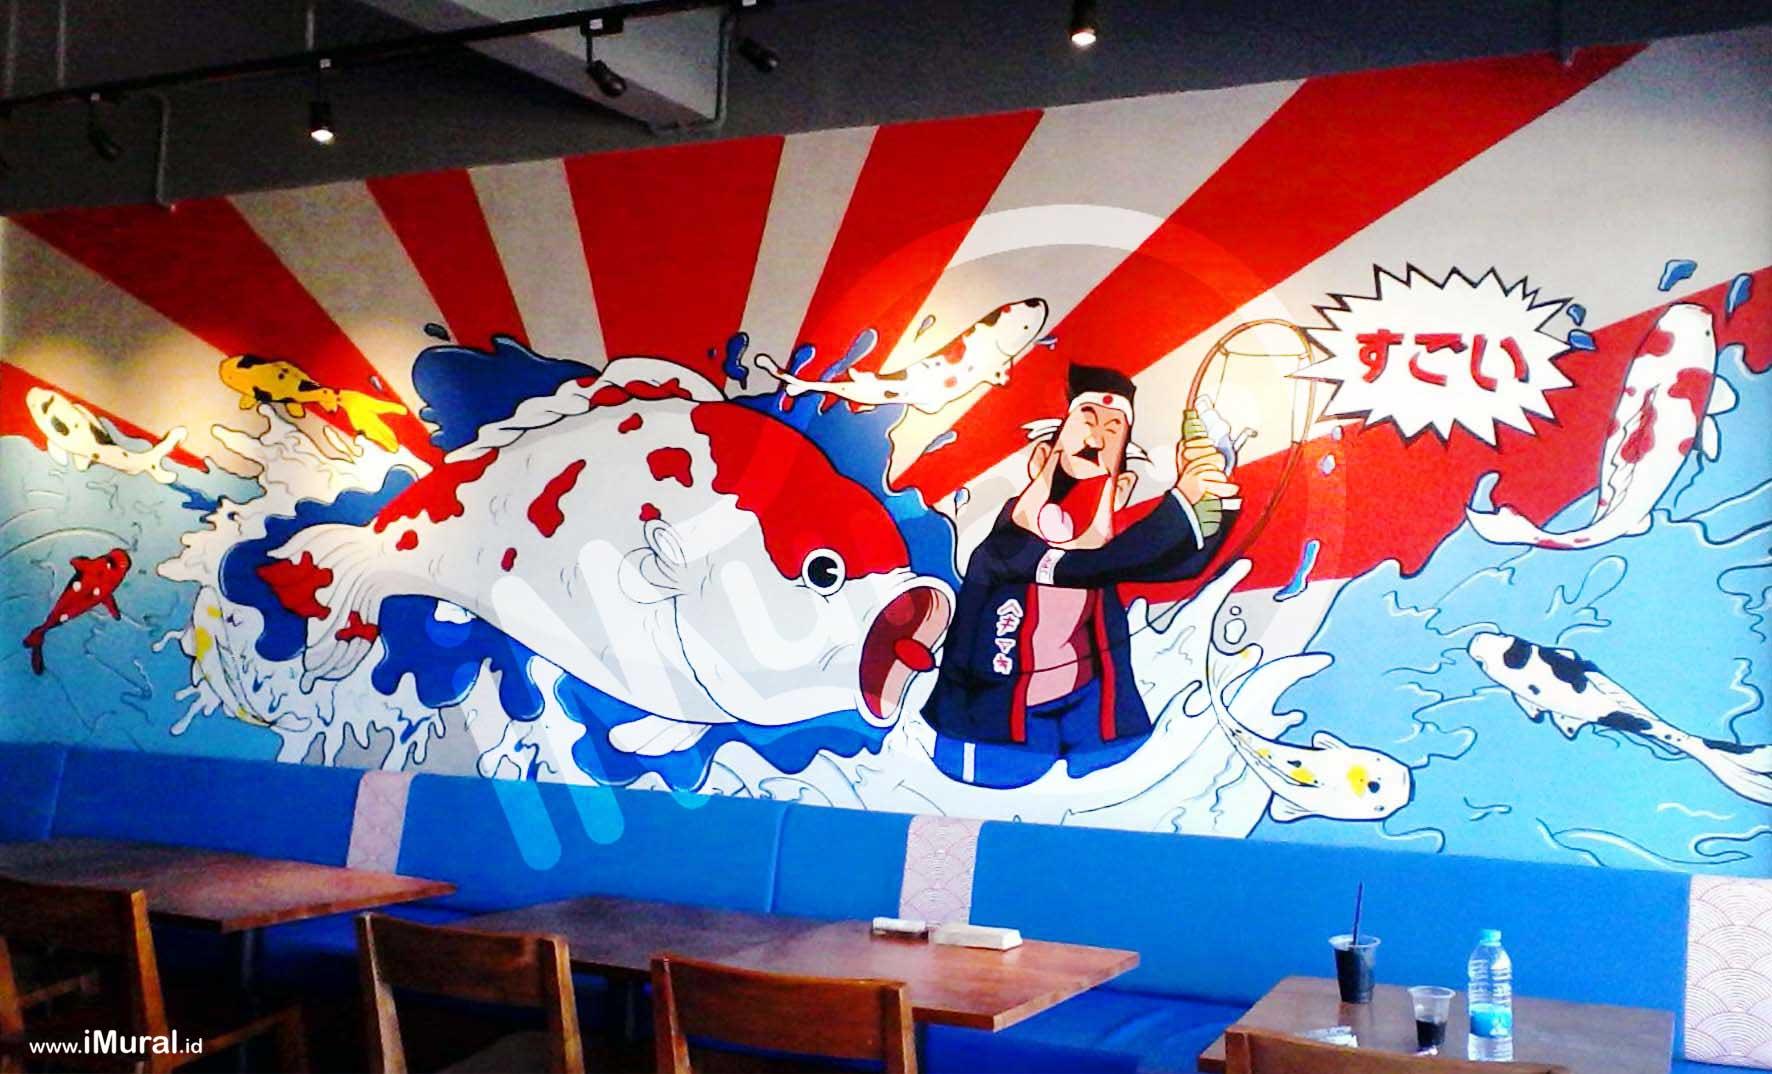 Mural at japanese restaurant imural